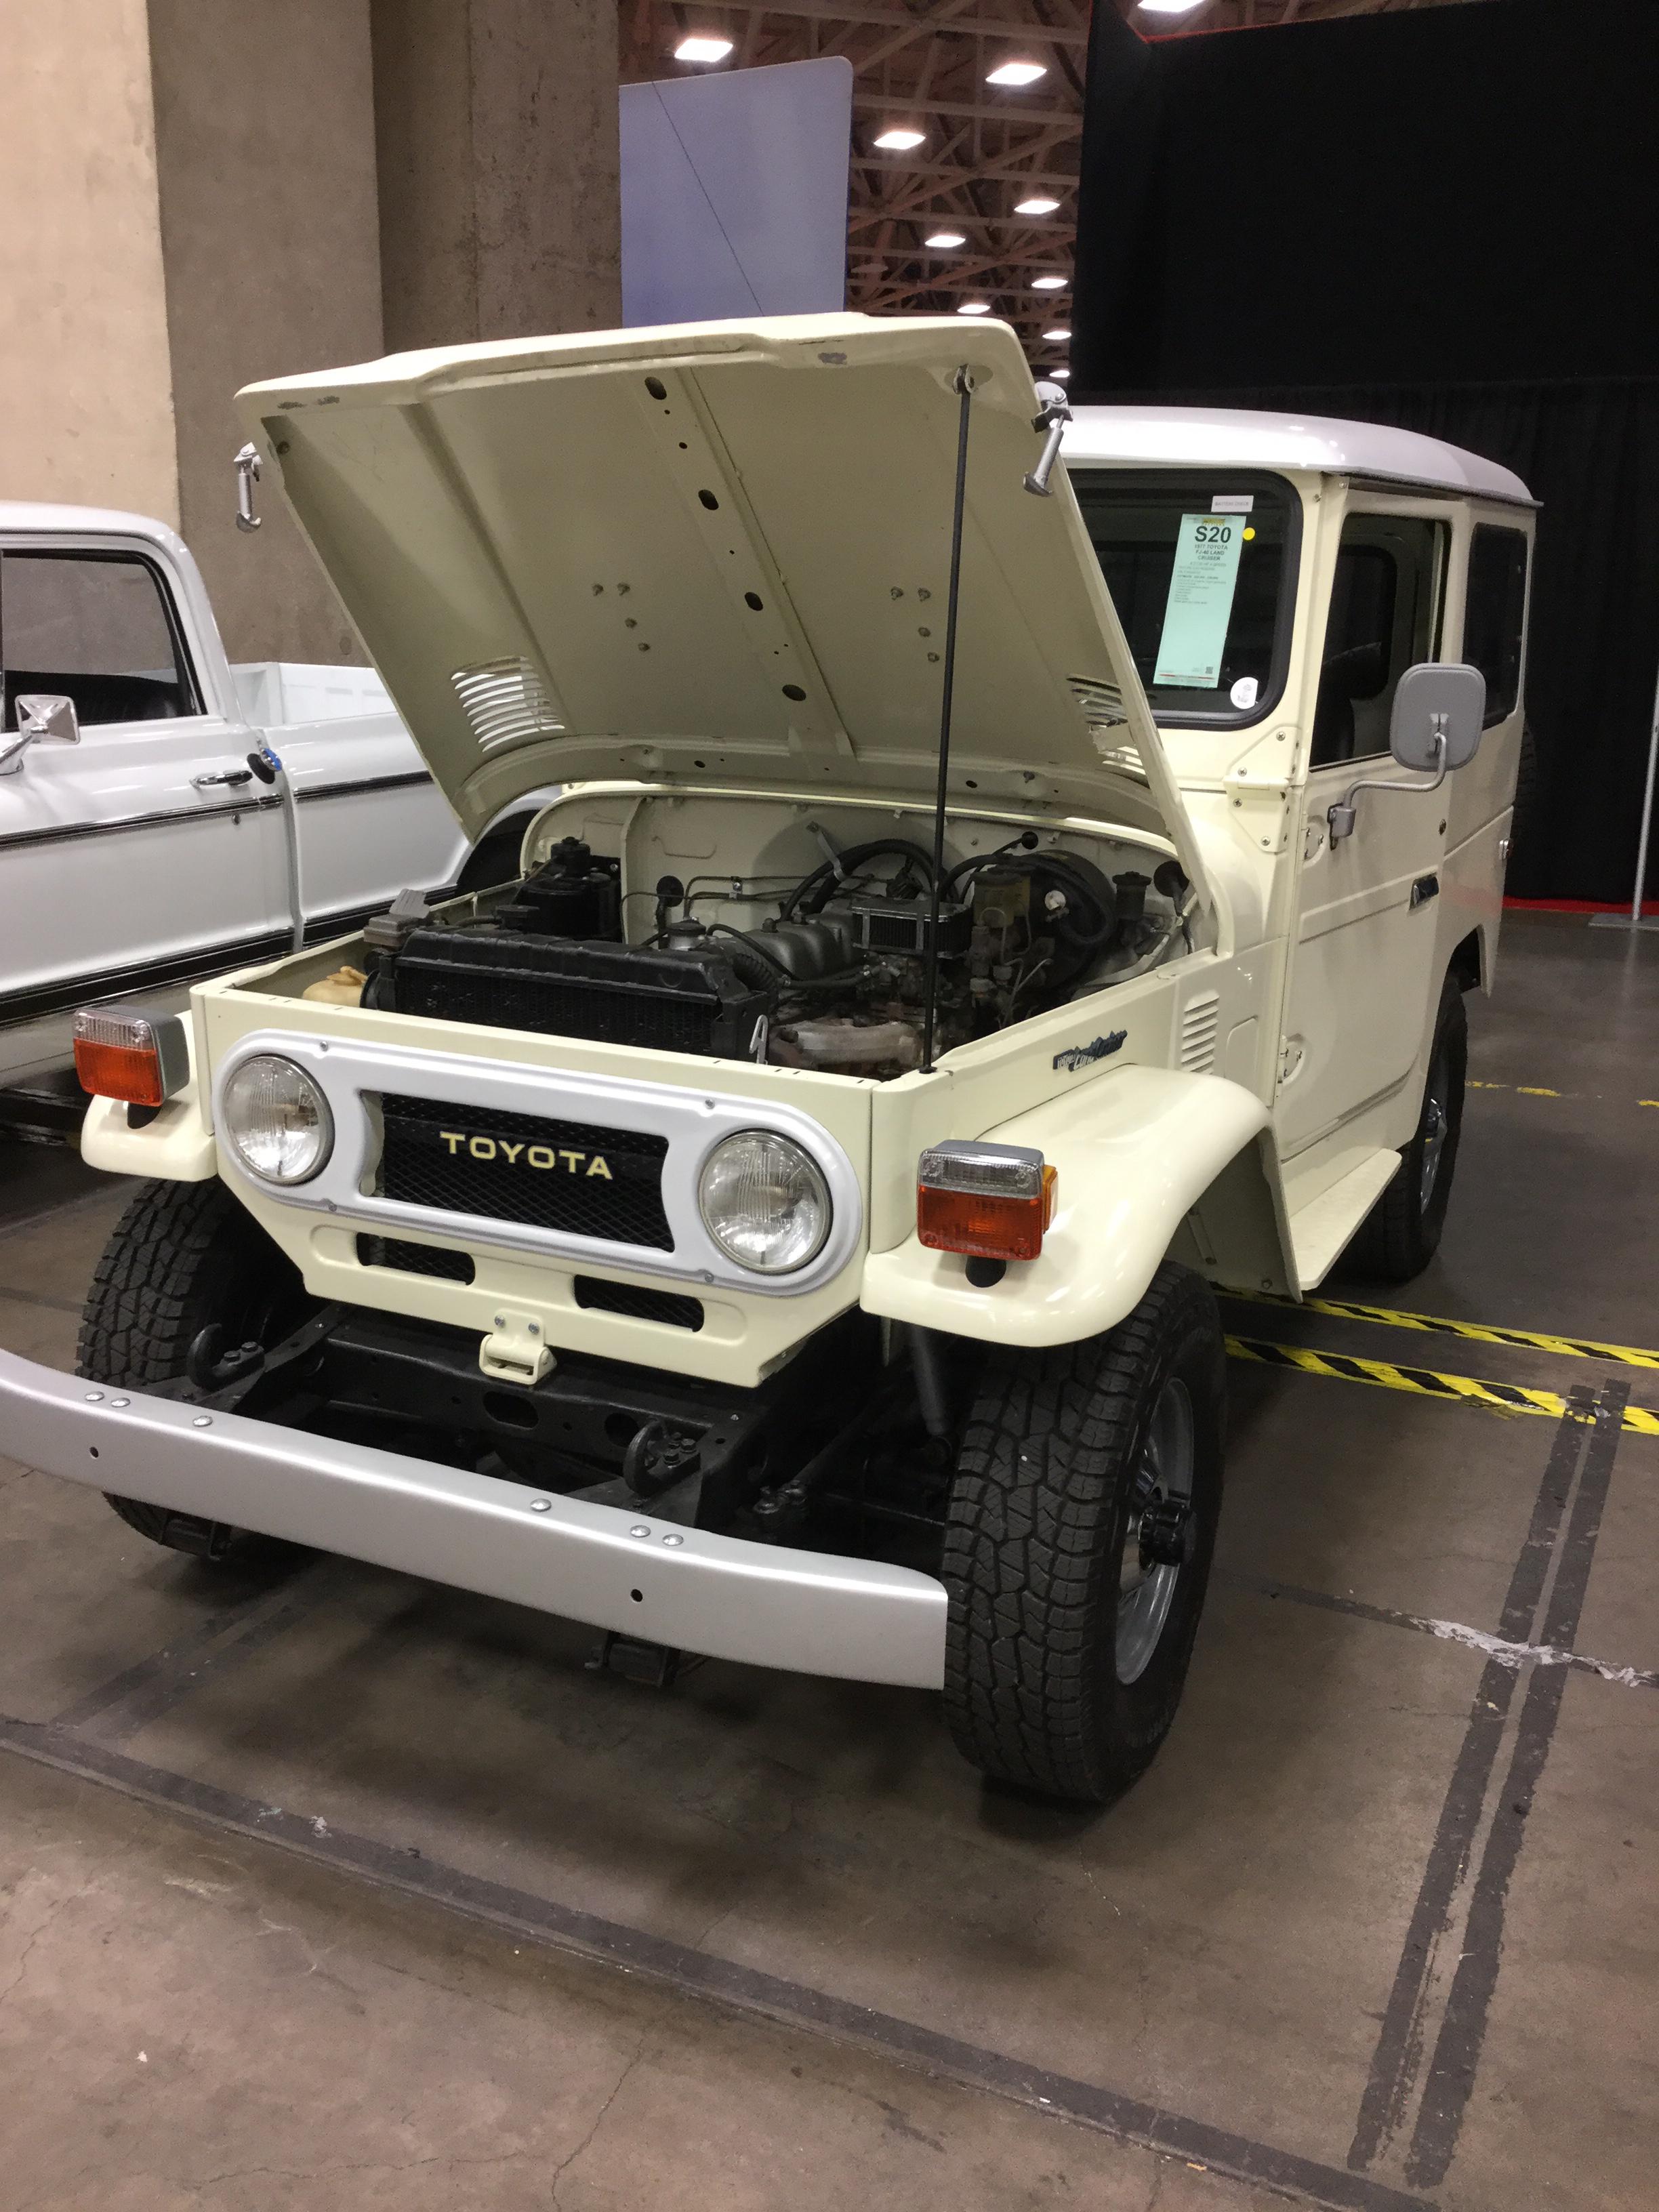 1975 Toyota Land Cruiser Fj40v Values Hagerty Valuation Tool 1960s Options 1977 Hardtop 4x4